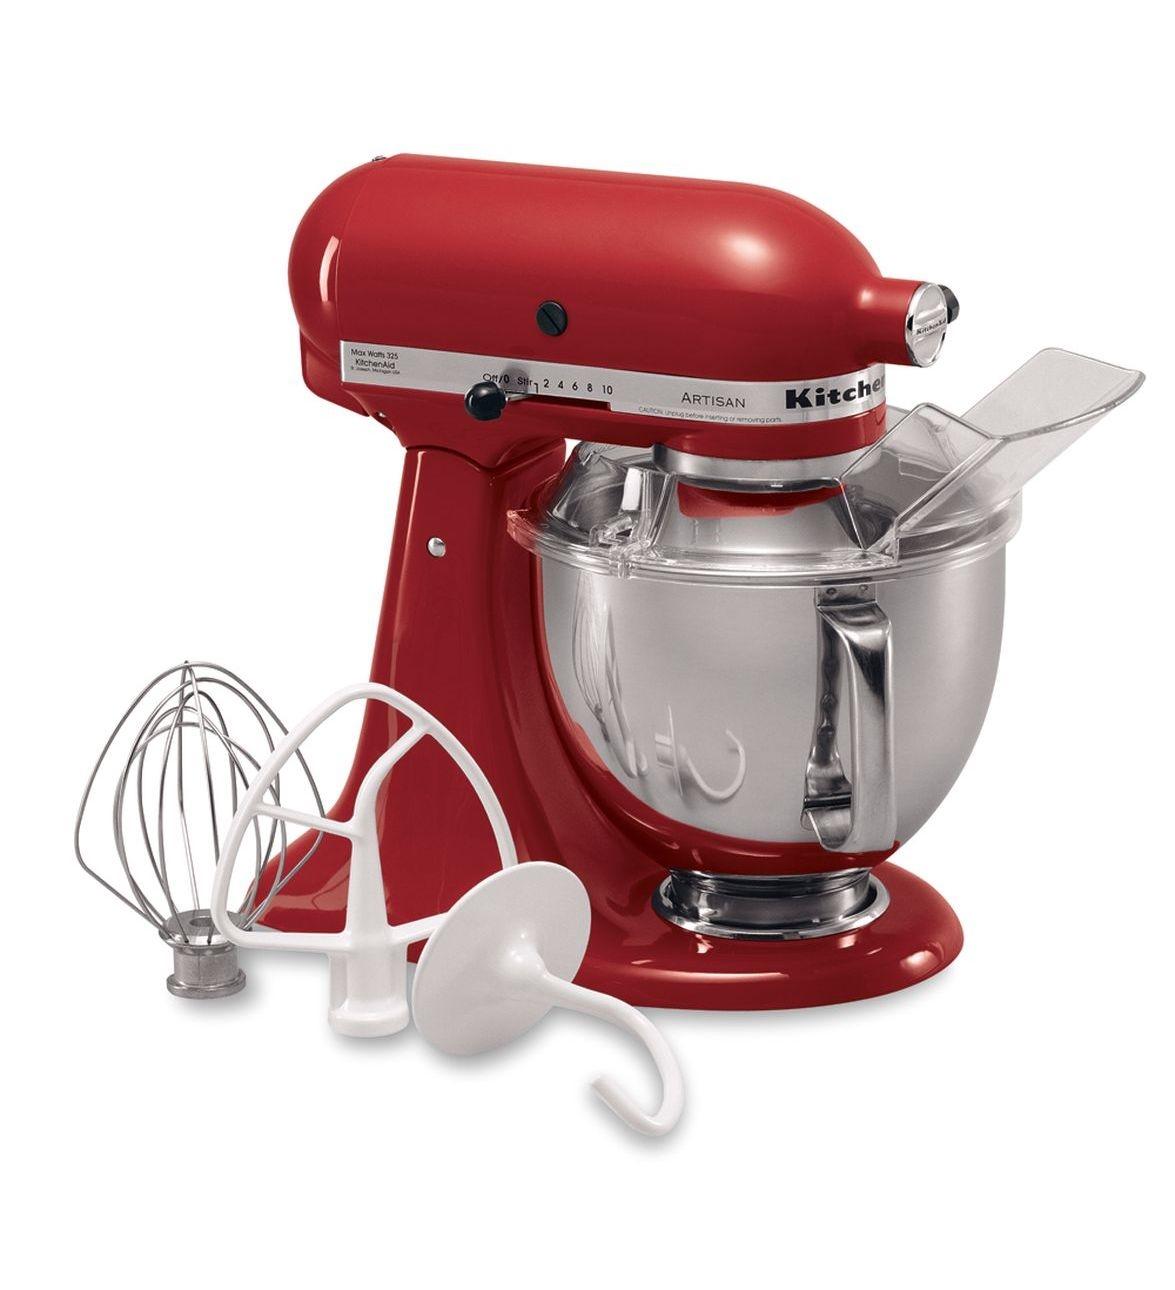 Robot da cucina kitchenaid artisan modello 5ksm150ps elettrodomestici a prezzi scontati - Robot da cucina prezzi ...